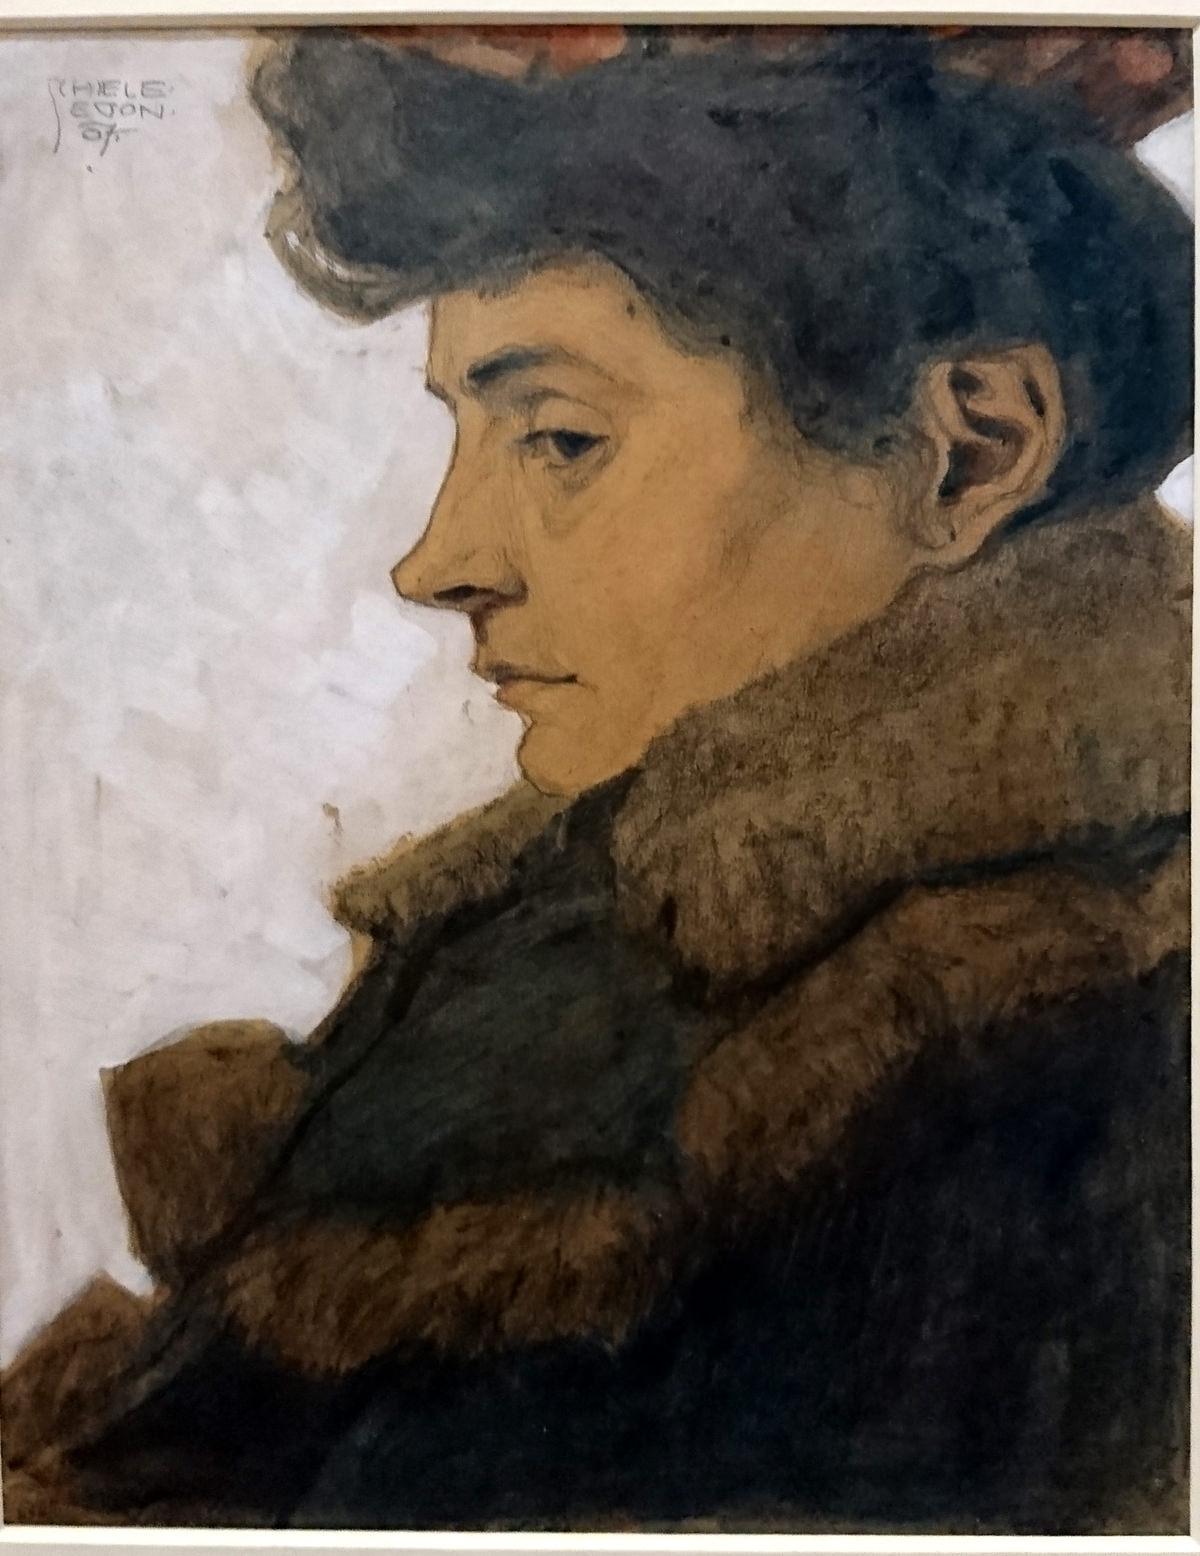 Leopold Museum Wien - Egon Schiele Gemälde - www.wien-erleben.com